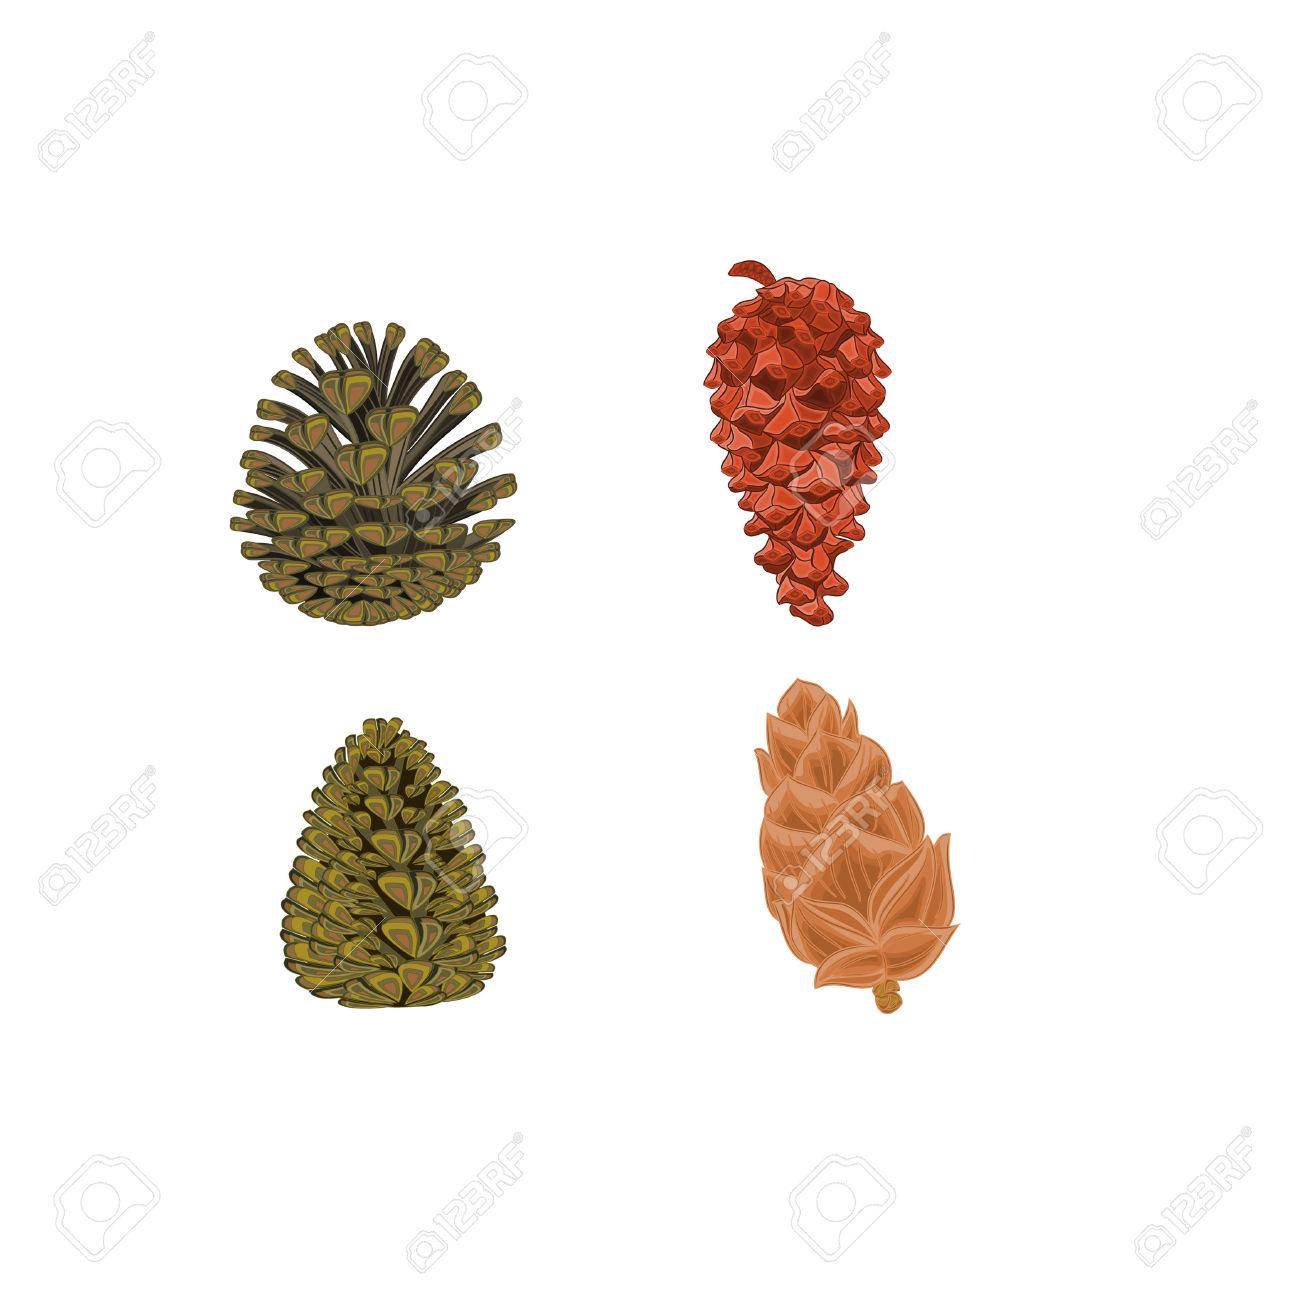 Four Pine Cones Larch Cones Vector Illustration Royalty Free.